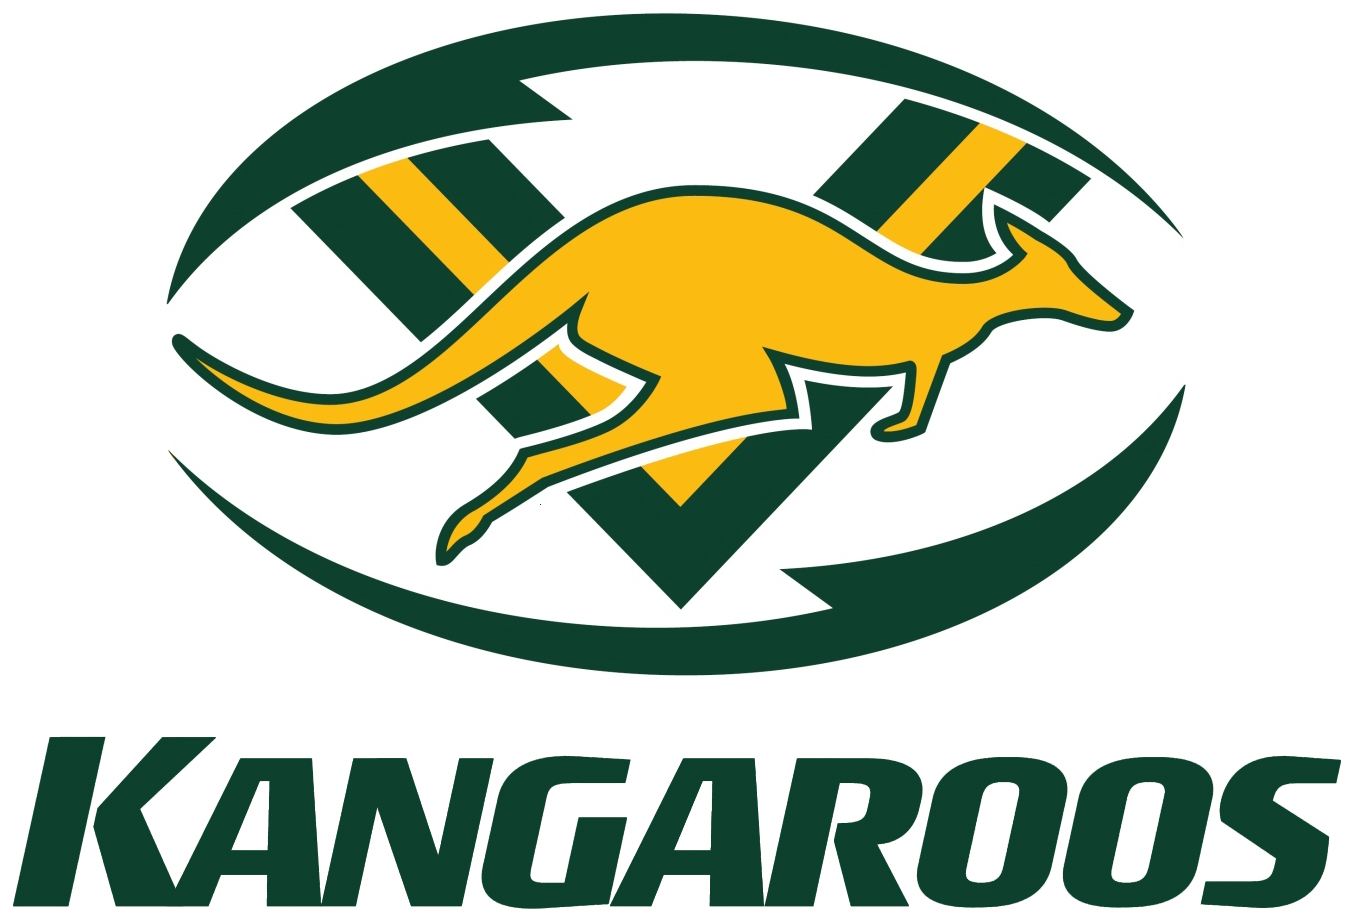 Rugby league logos australia